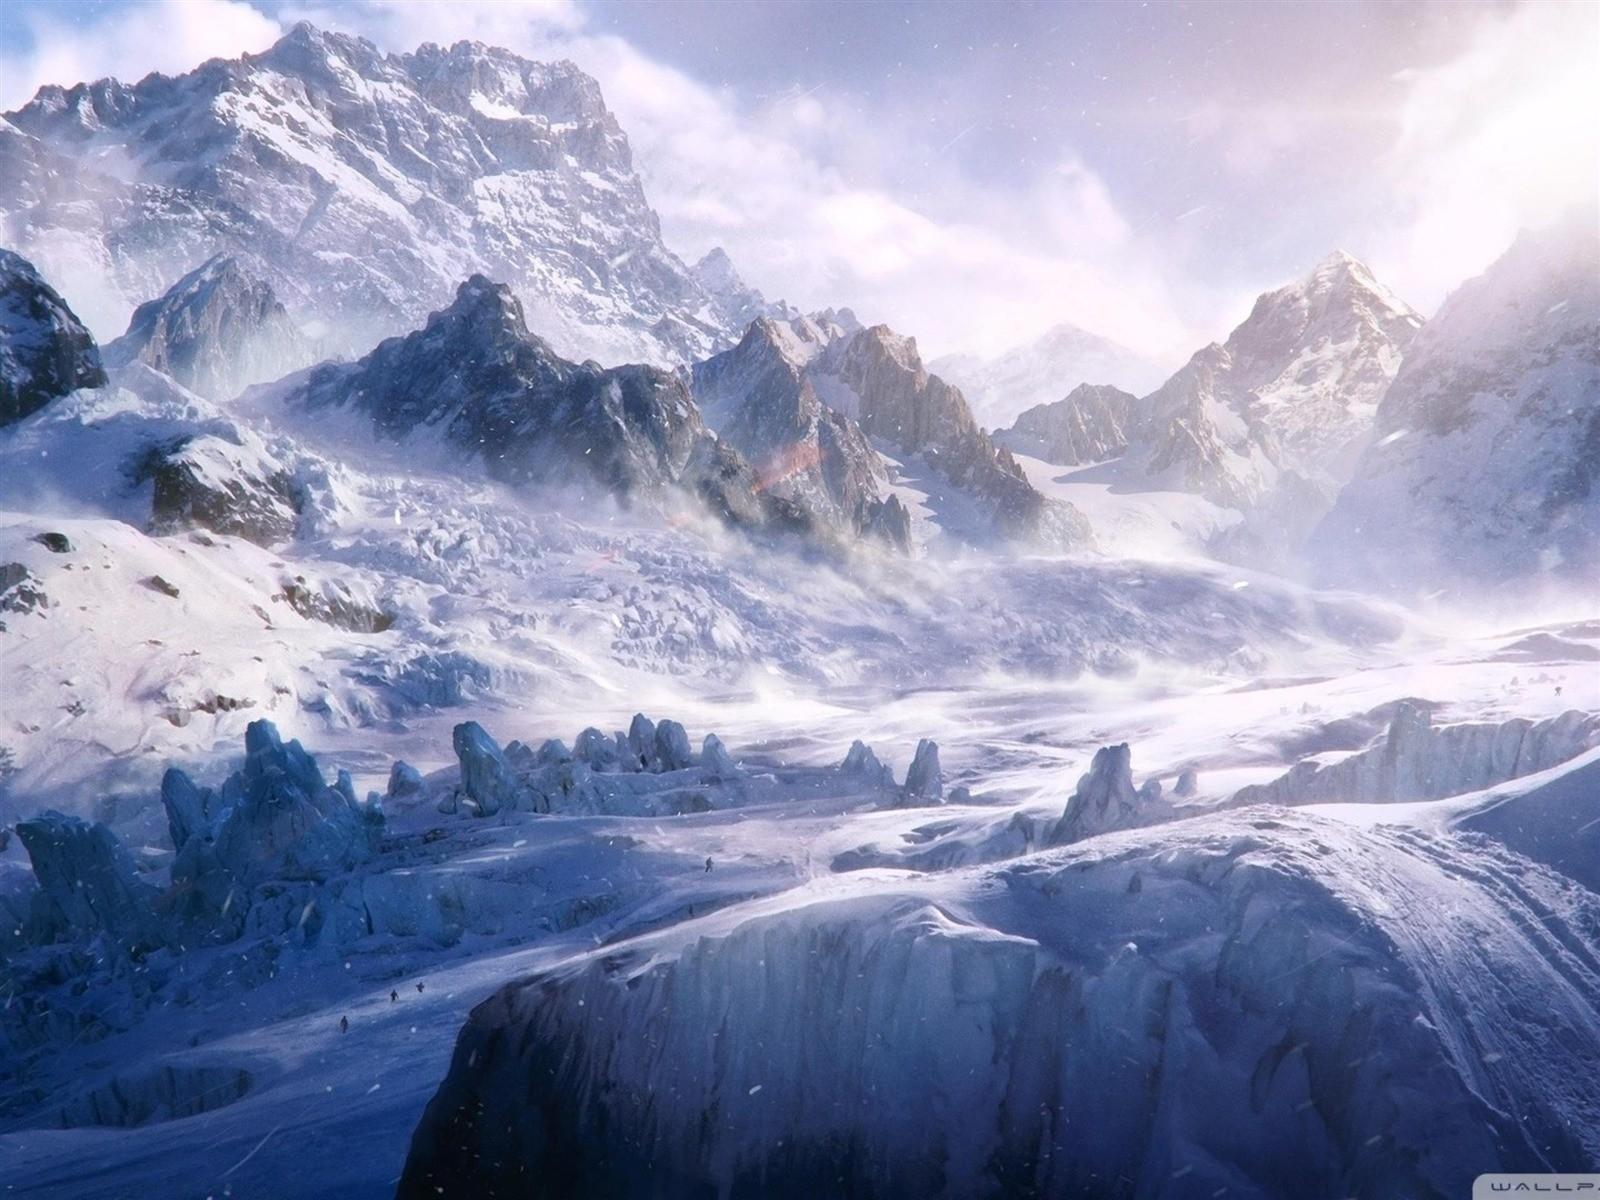 Sfondi Montagne Fantasy Art Natura La Neve Inverno Opera D